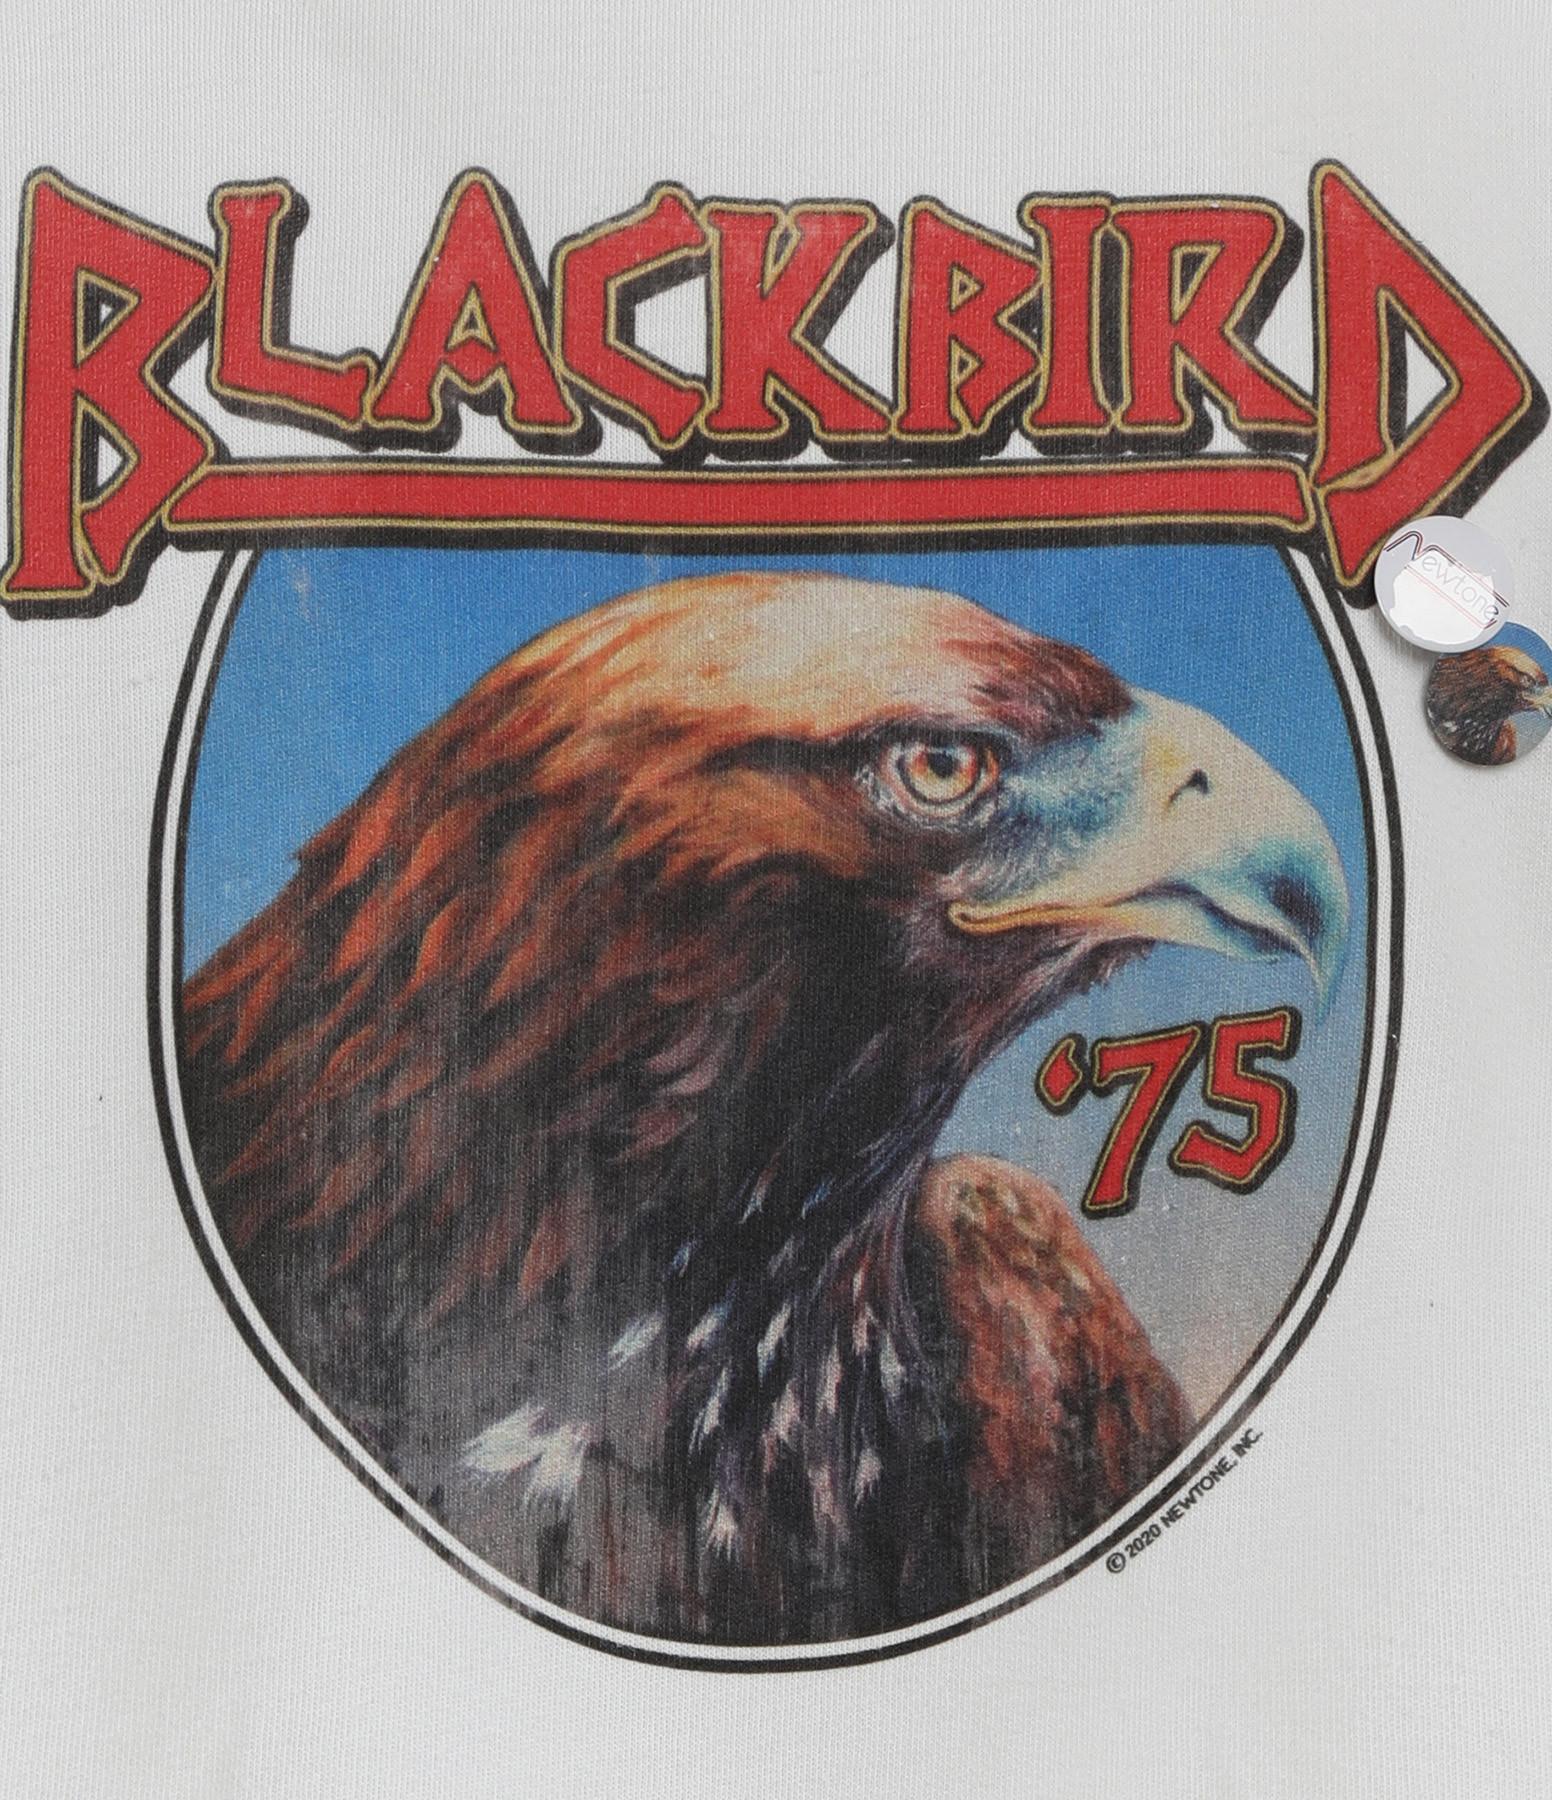 NEWTONE - Sweatshirt Roller Blackbird Coton Beige